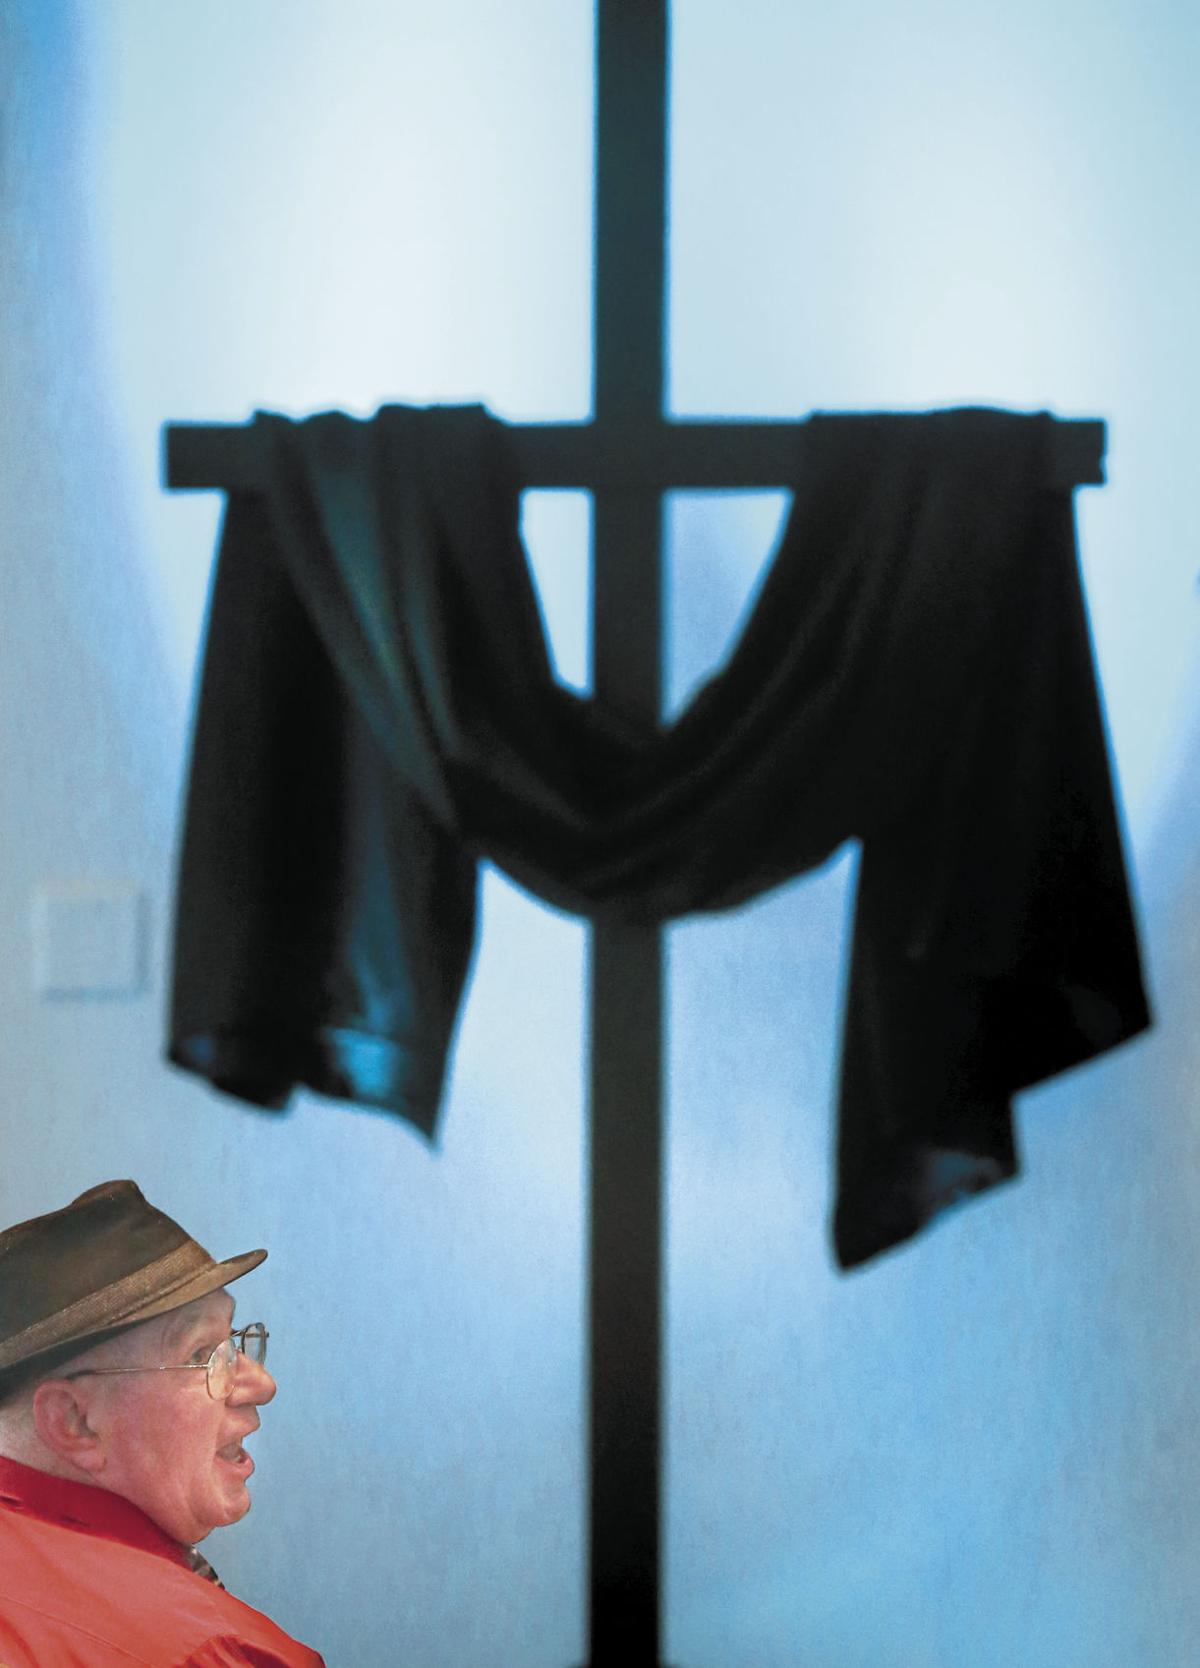 Church celebrates new beginnings